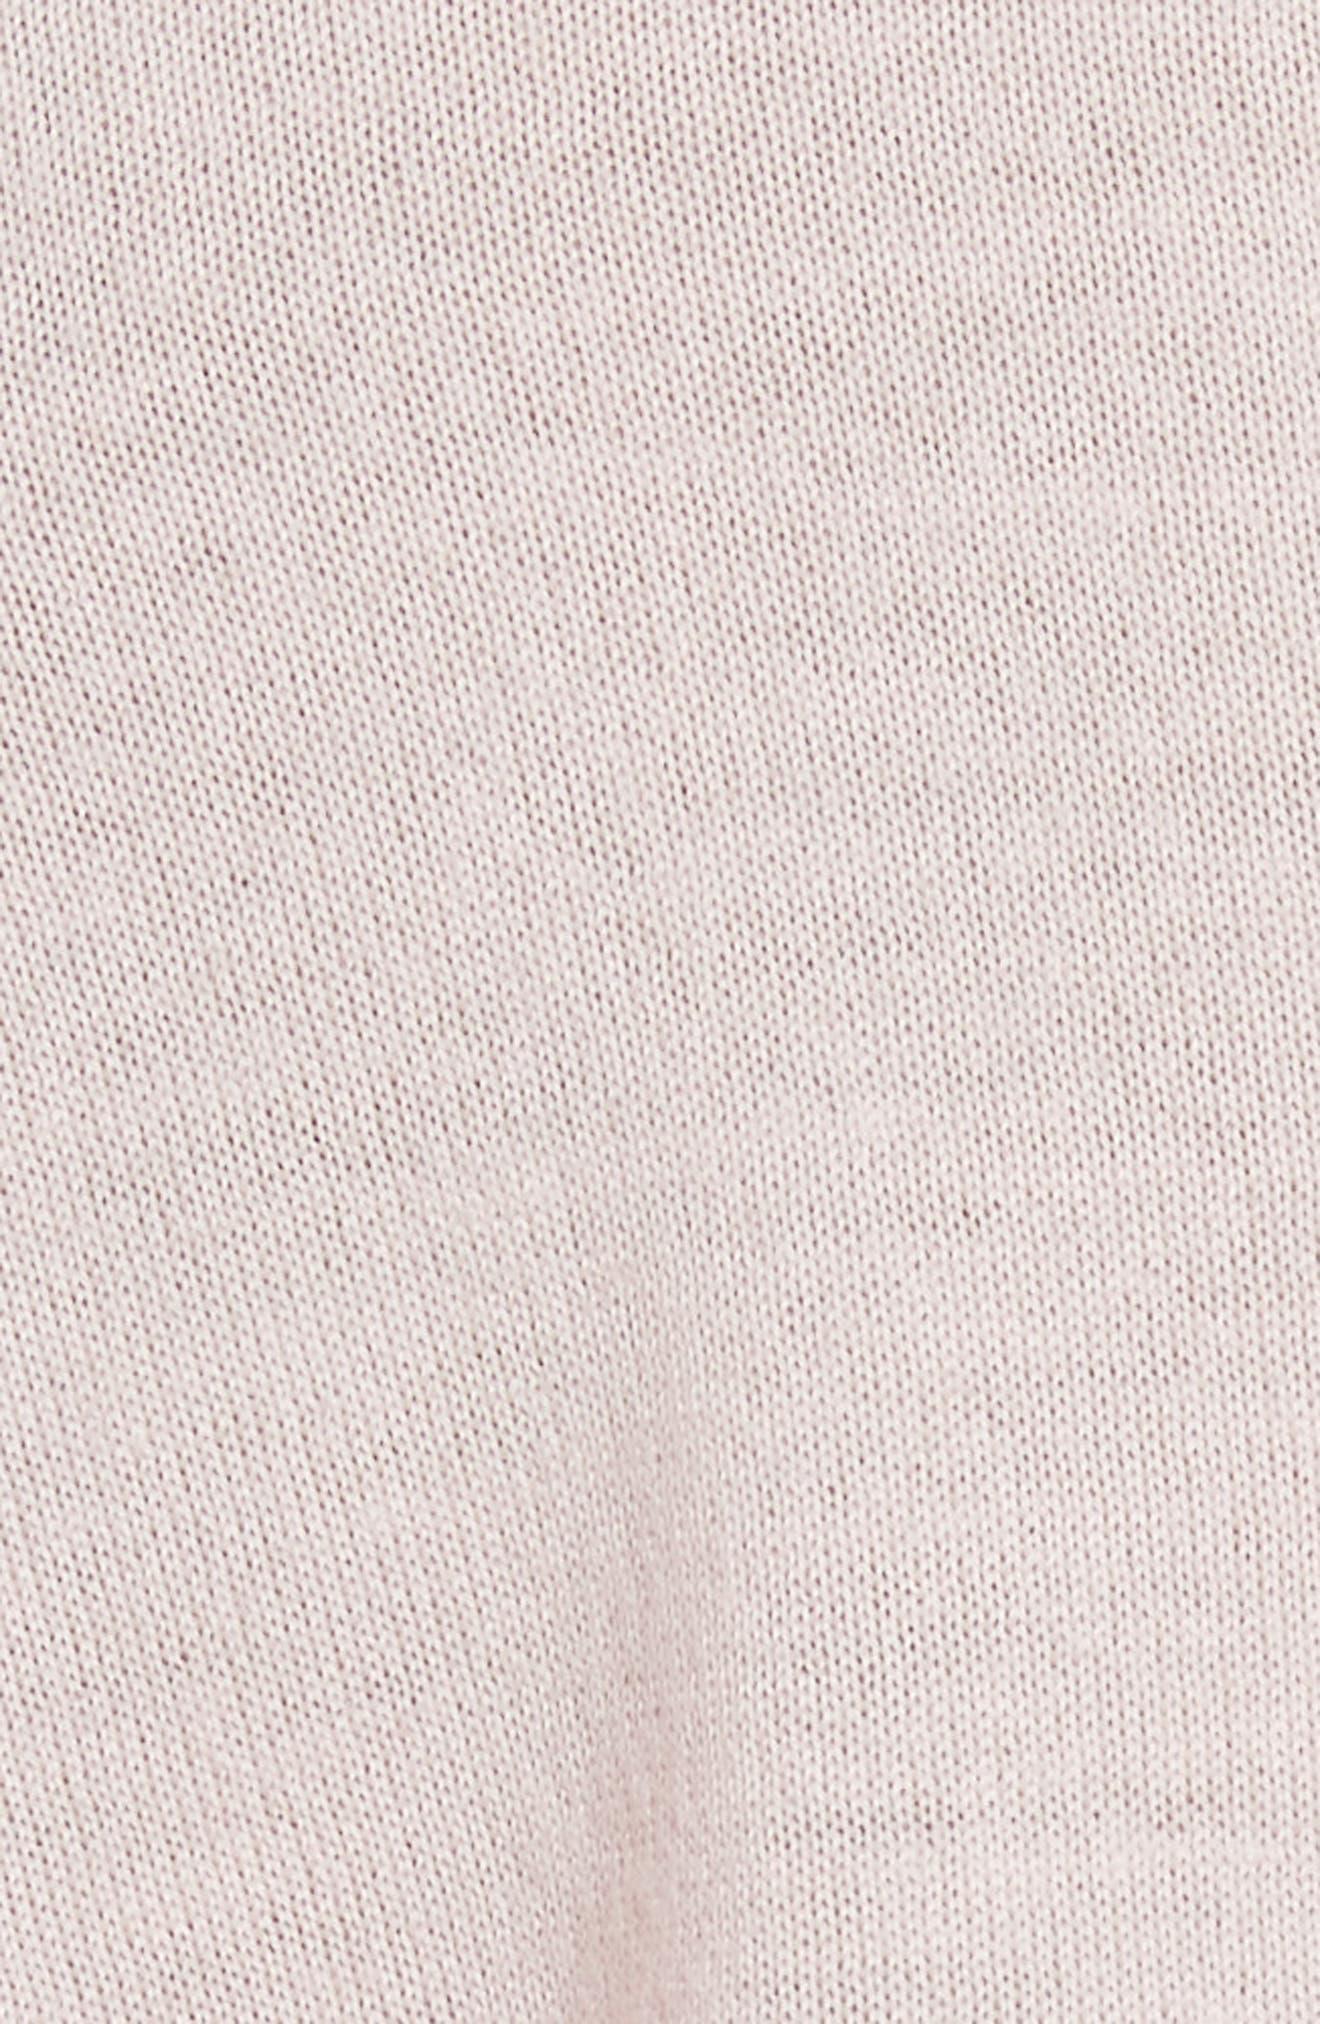 True Crewneck Wool Sweater,                             Alternate thumbnail 5, color,                             Powder Pink